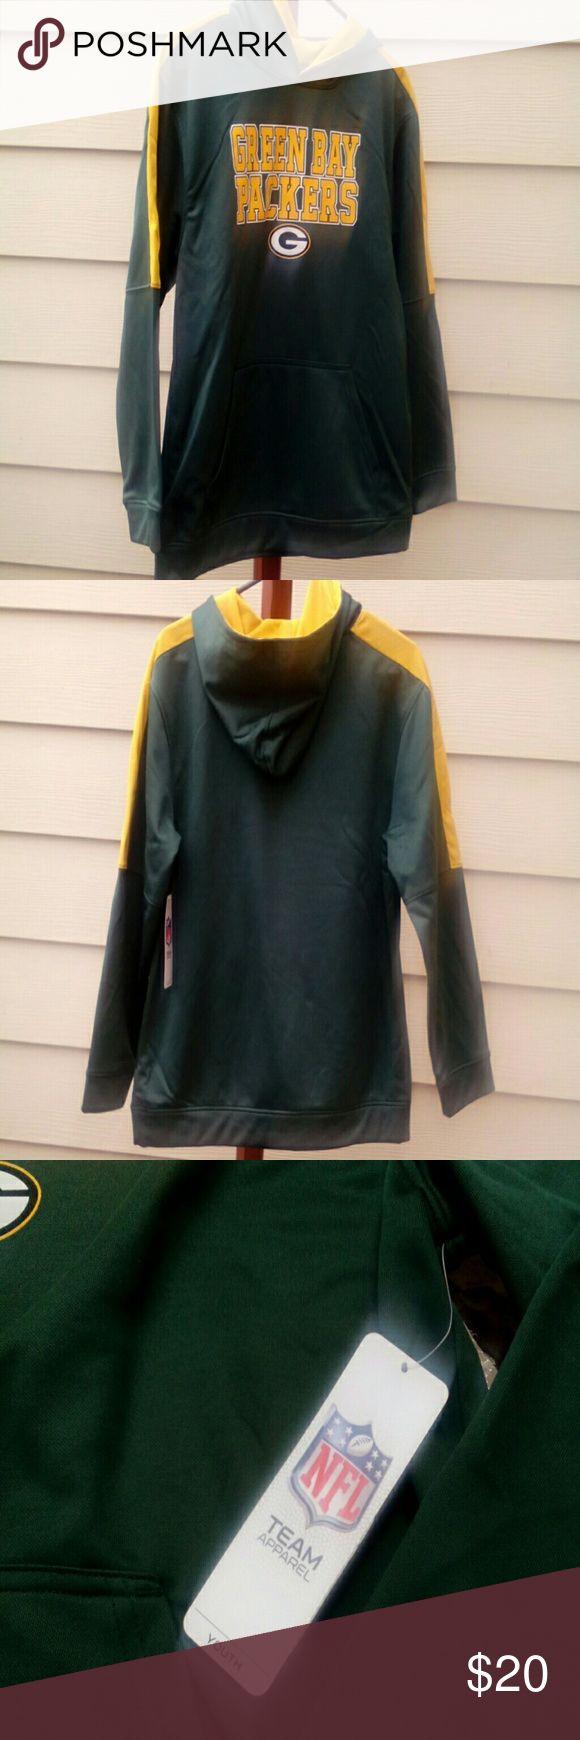 Youth Green Bay Packer hoodie NWT, smoke free home youth xxl(18) NFL Team Apparel Shirts & Tops Sweatshirts & Hoodies